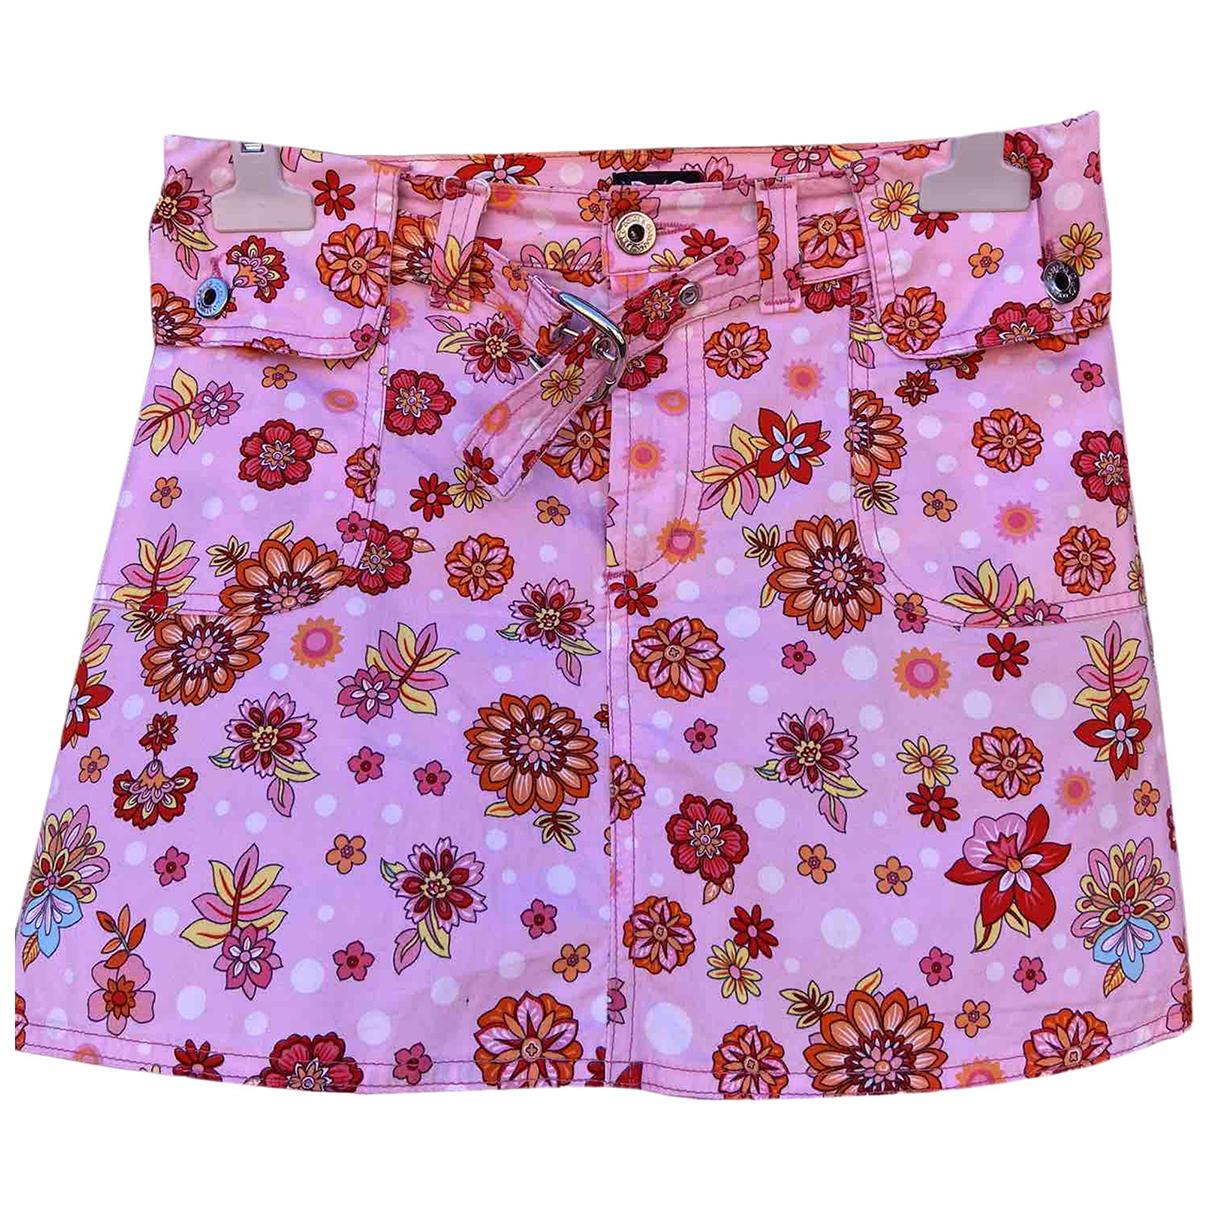 D&g \N Pink Cotton skirt for Women 38 IT